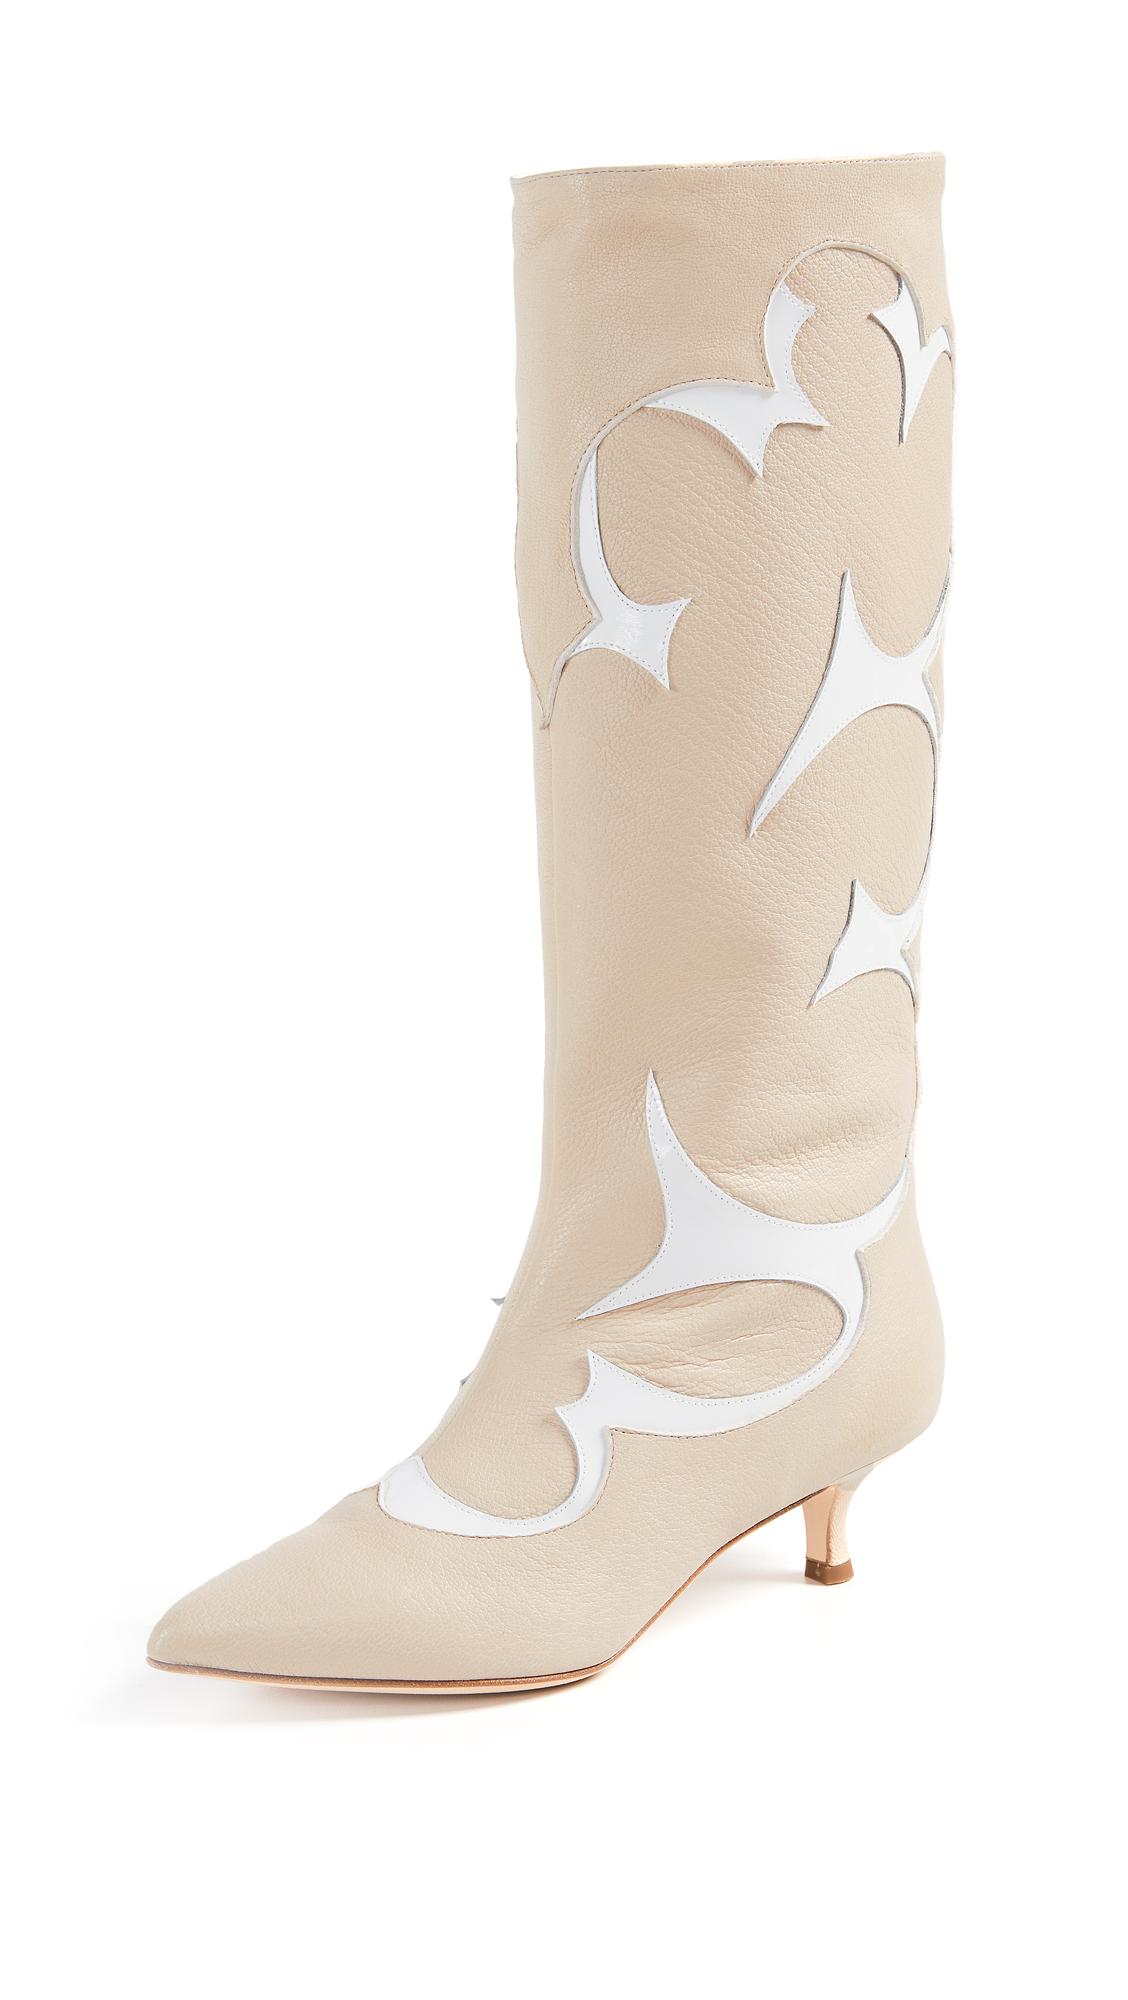 Tibi Jagger Boots - Natural/White Multi